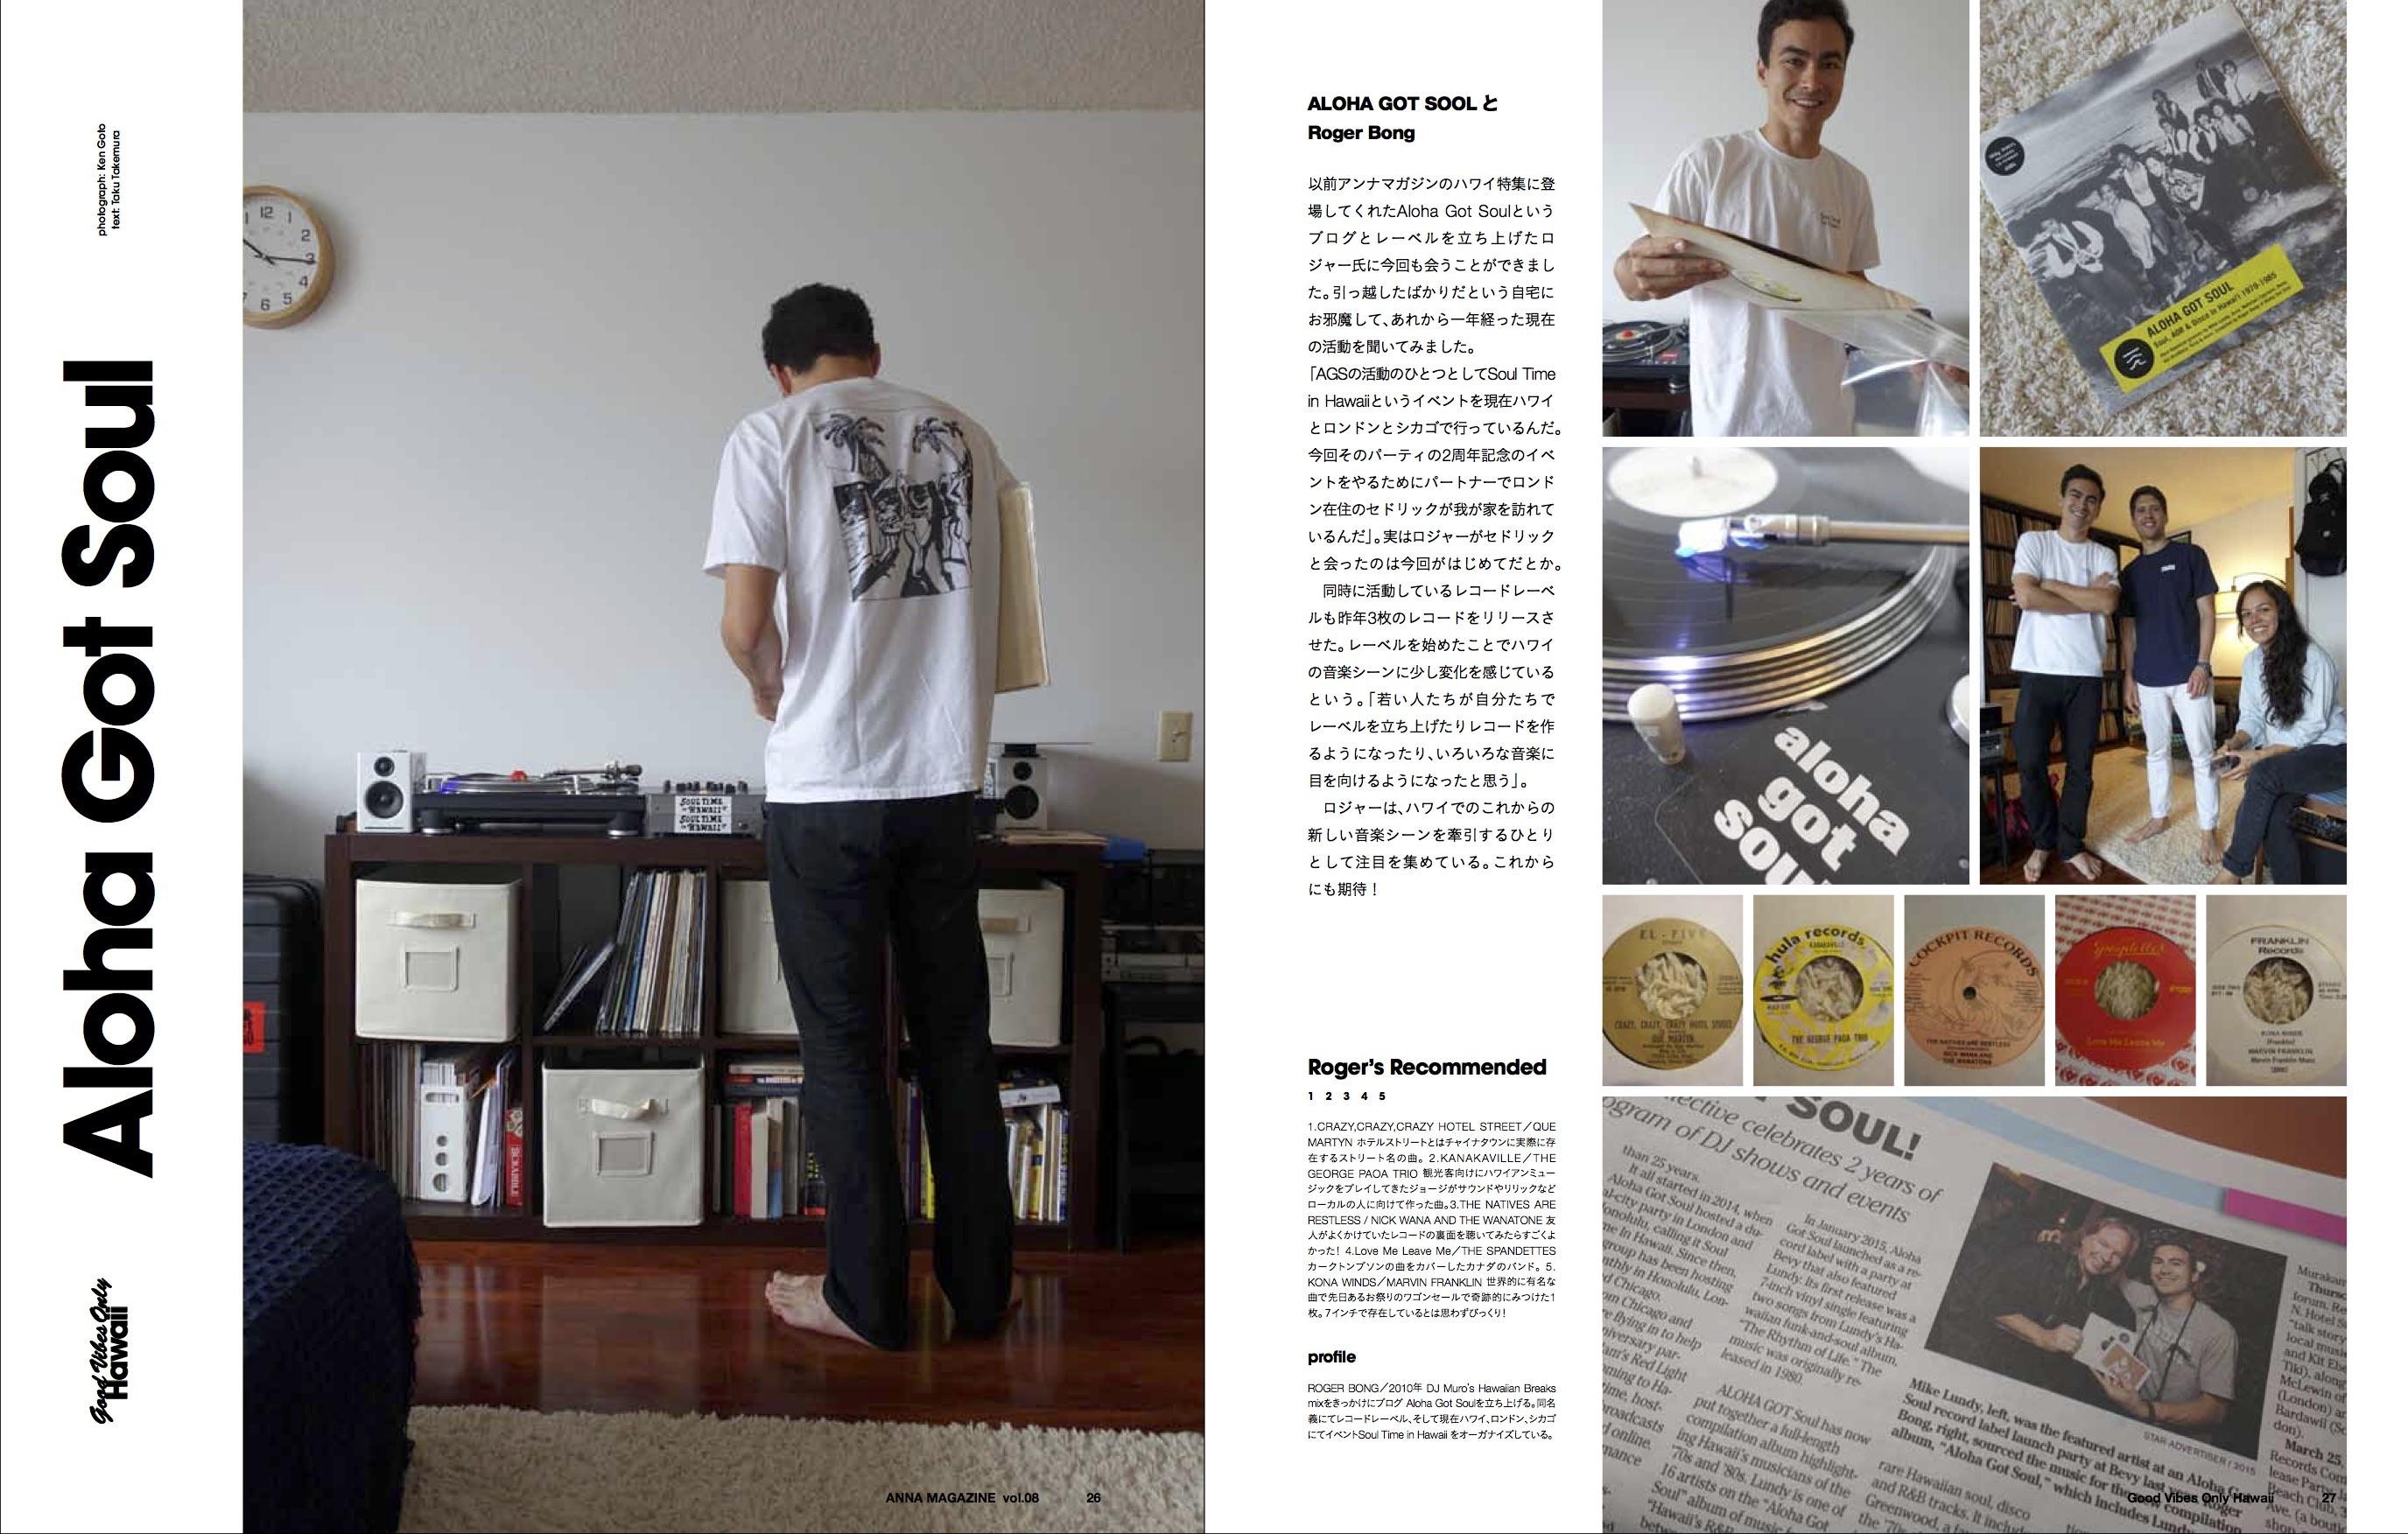 anna magazine vol.8 P12